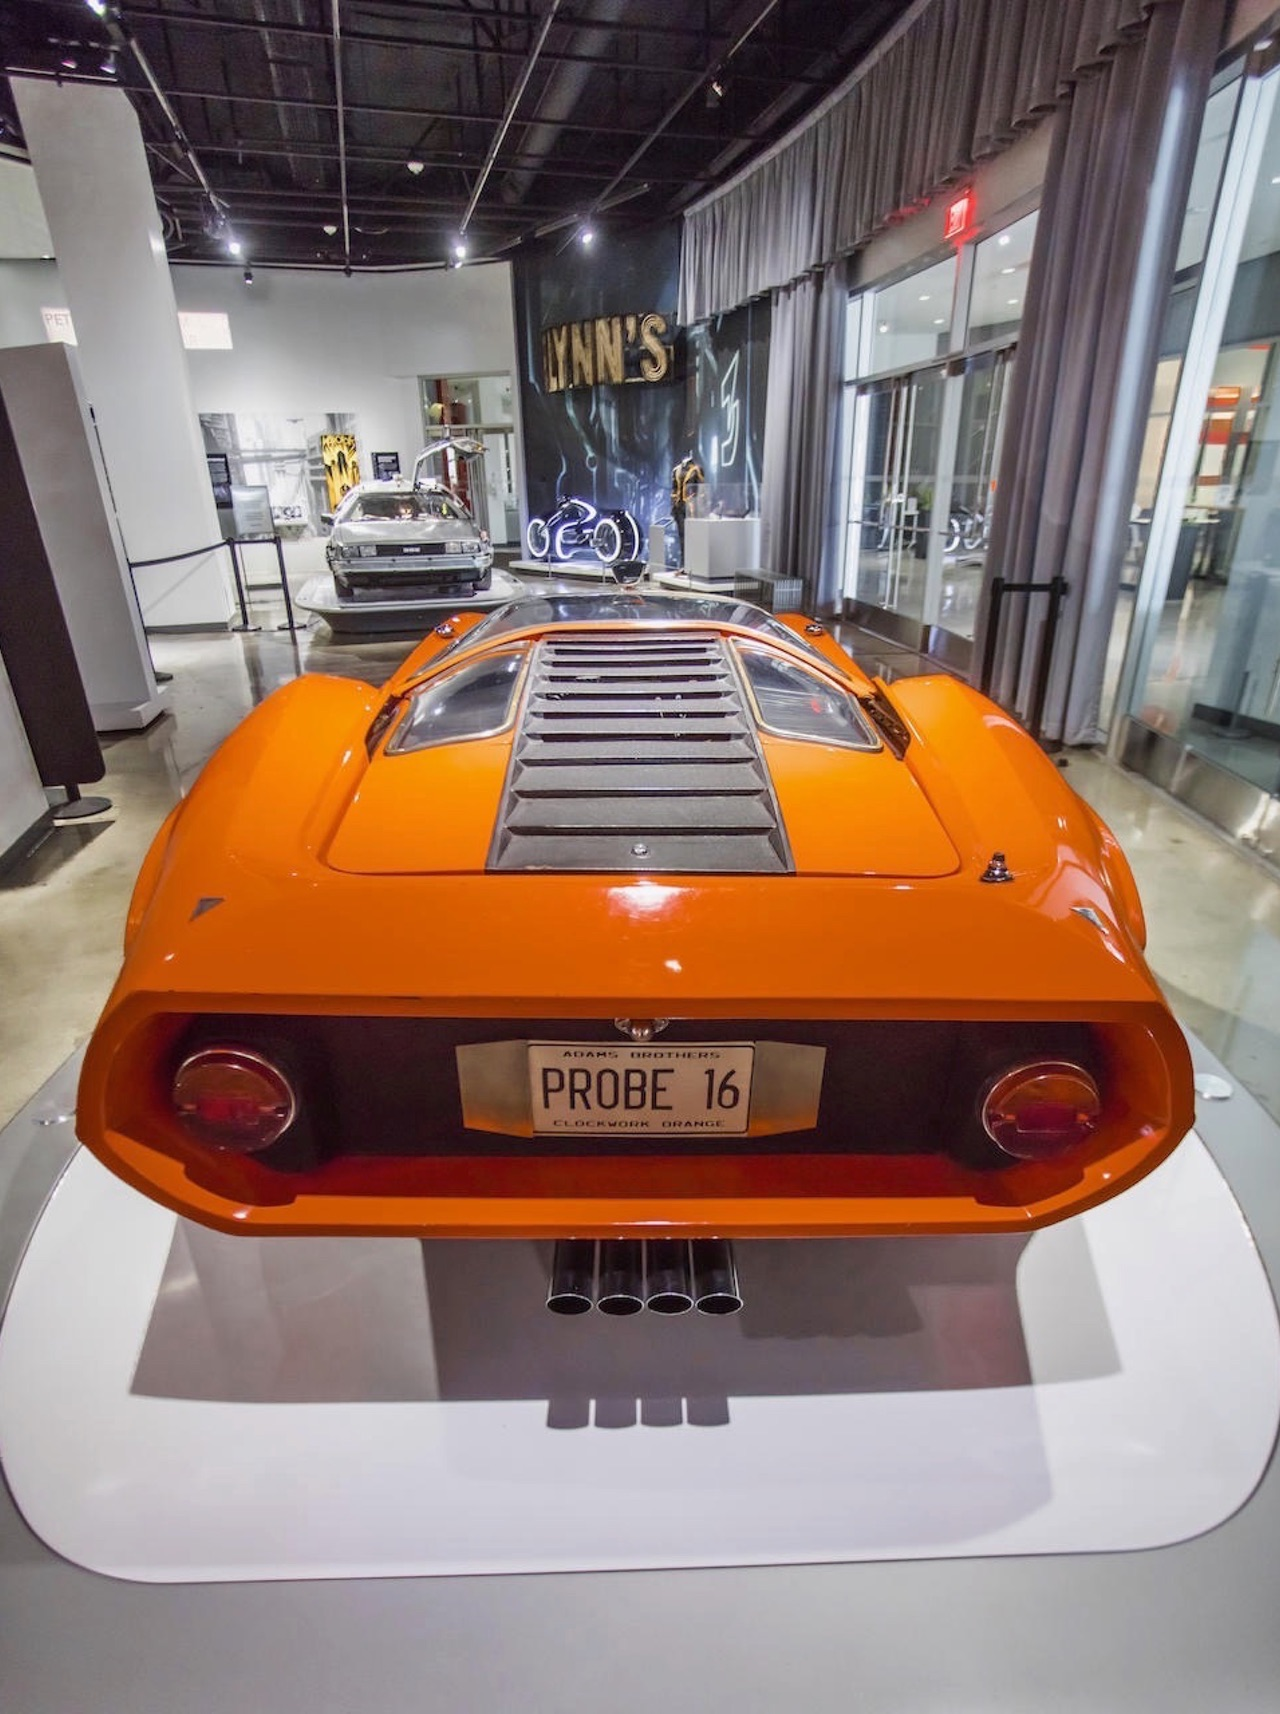 '69 Adams Brothers Probe 16... Orange mécanique ! 4